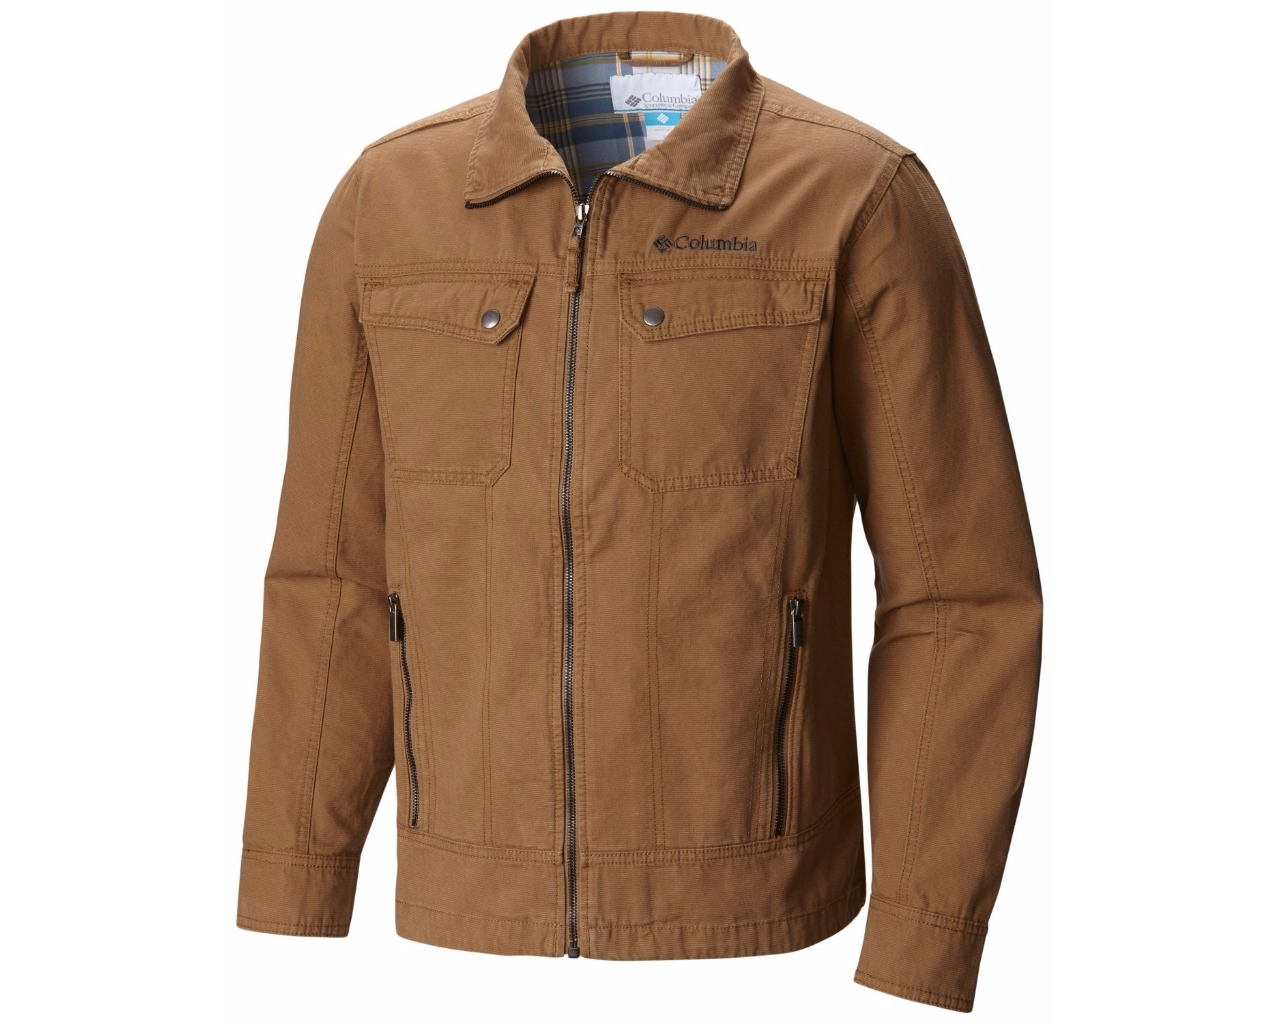 Sale Куртка-ветровка мужская Columbia Rough Country™ коричневый  арт.1580181-257 d9cd18f1169